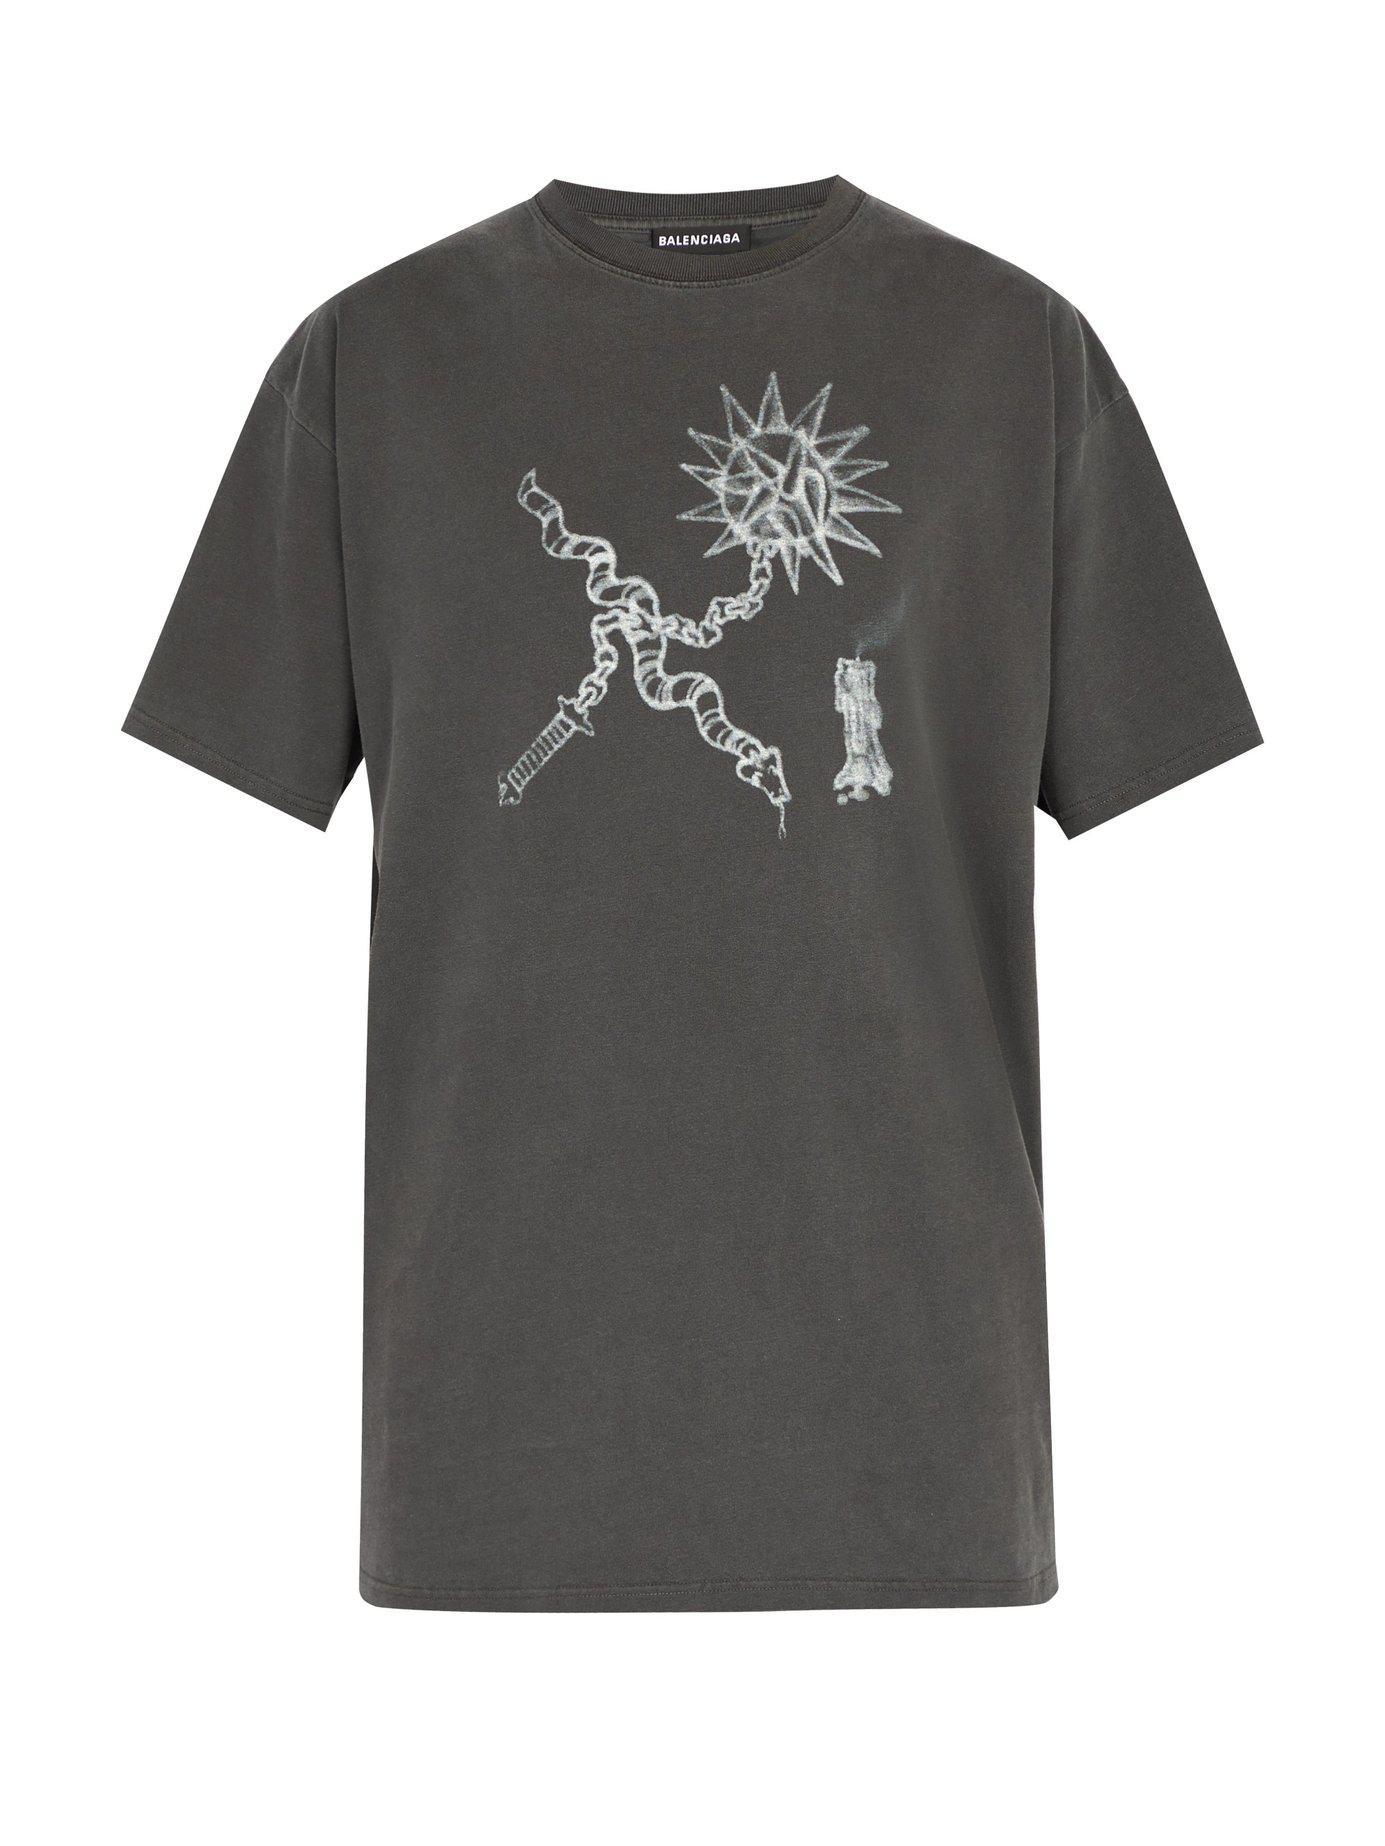 523e9a901e8b Balenciaga - Black Goth Oversized Cotton T Shirt for Men - Lyst. View  fullscreen